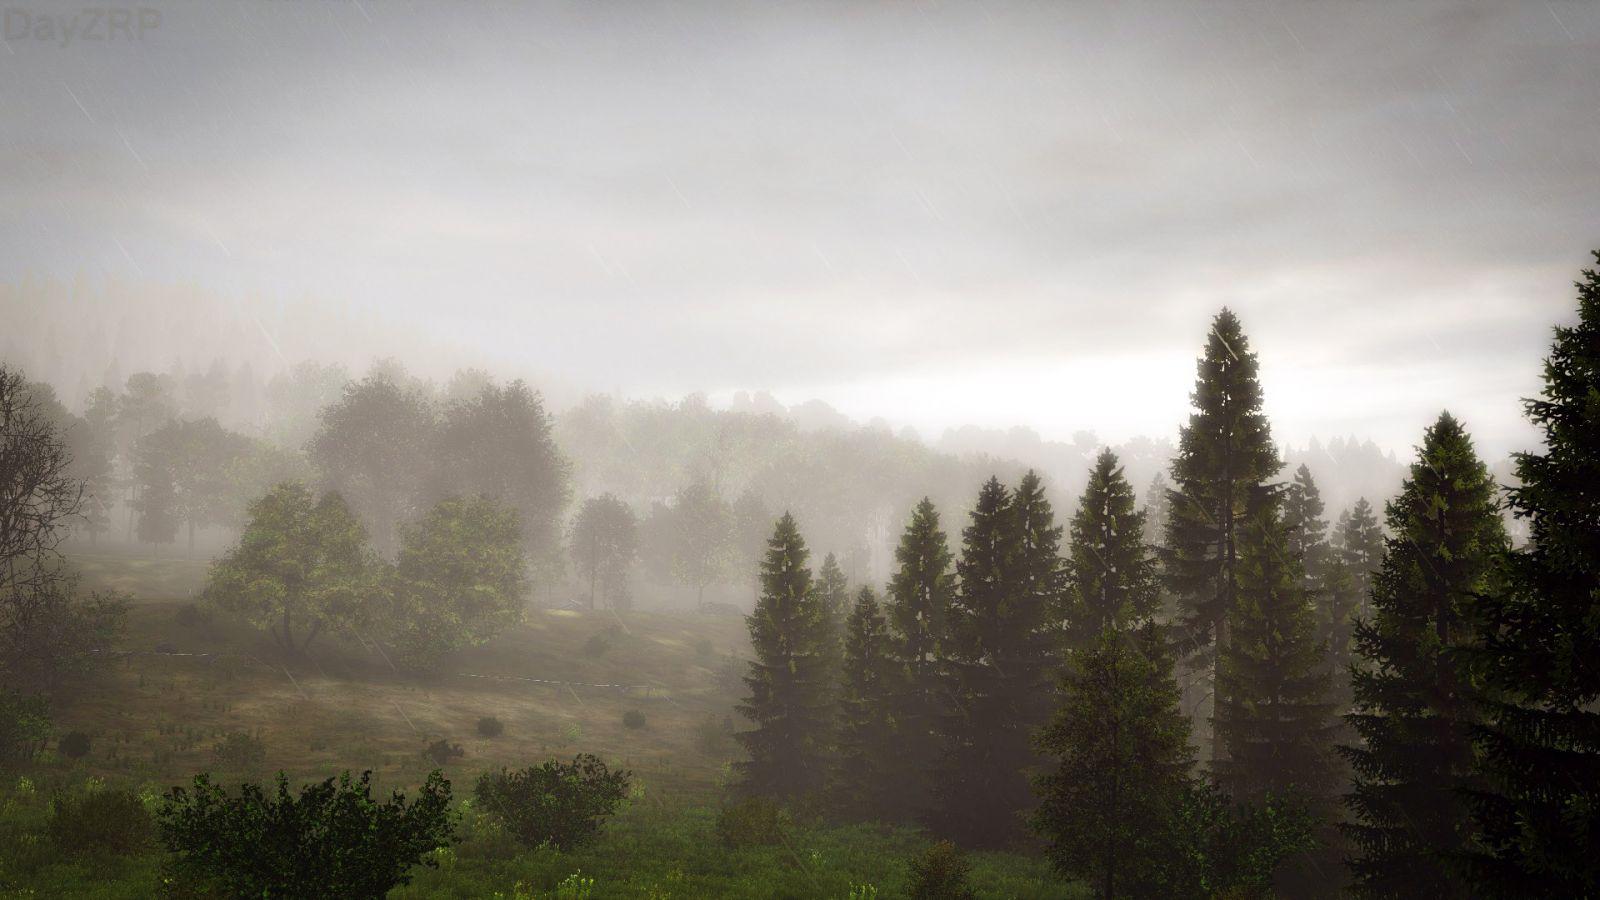 Rainy Mist in the Morning